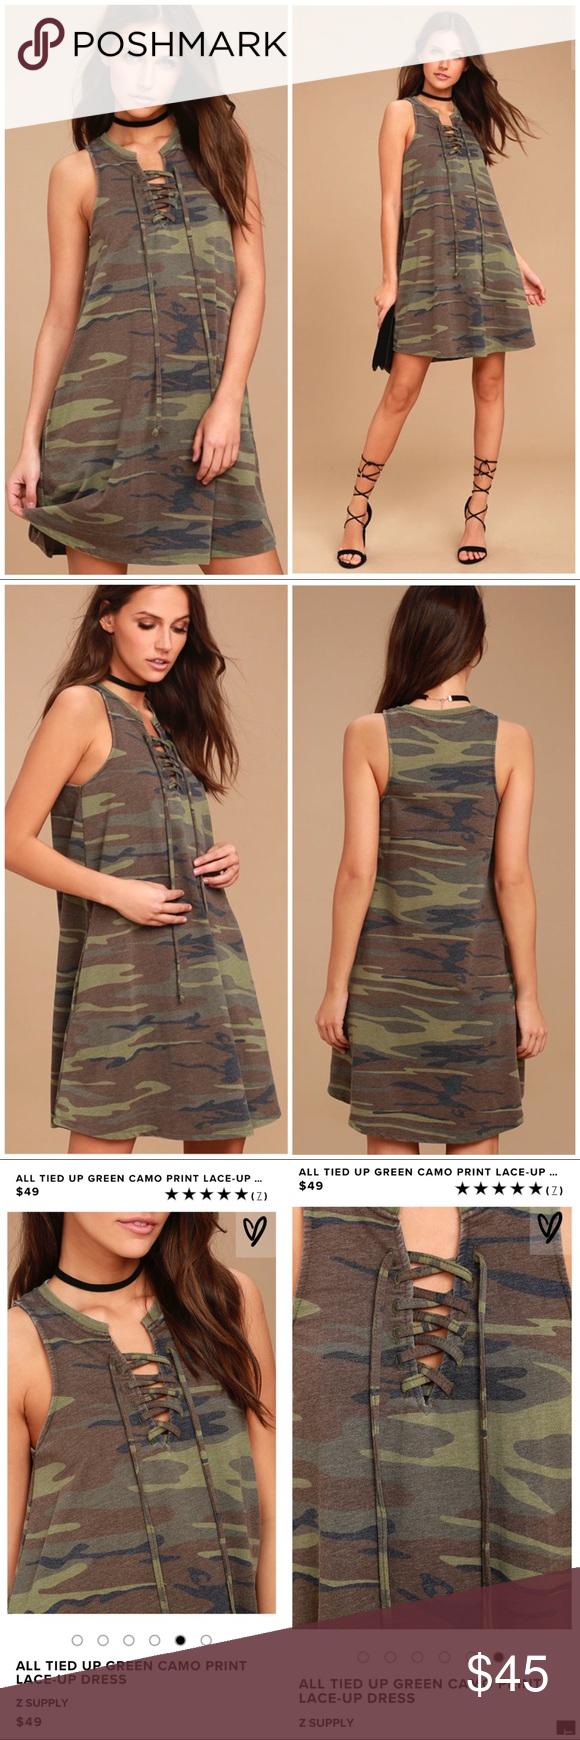 Green lace up dress  Loft Sleeveless Navy Blue Dress  Pinterest  Navy blue dresses